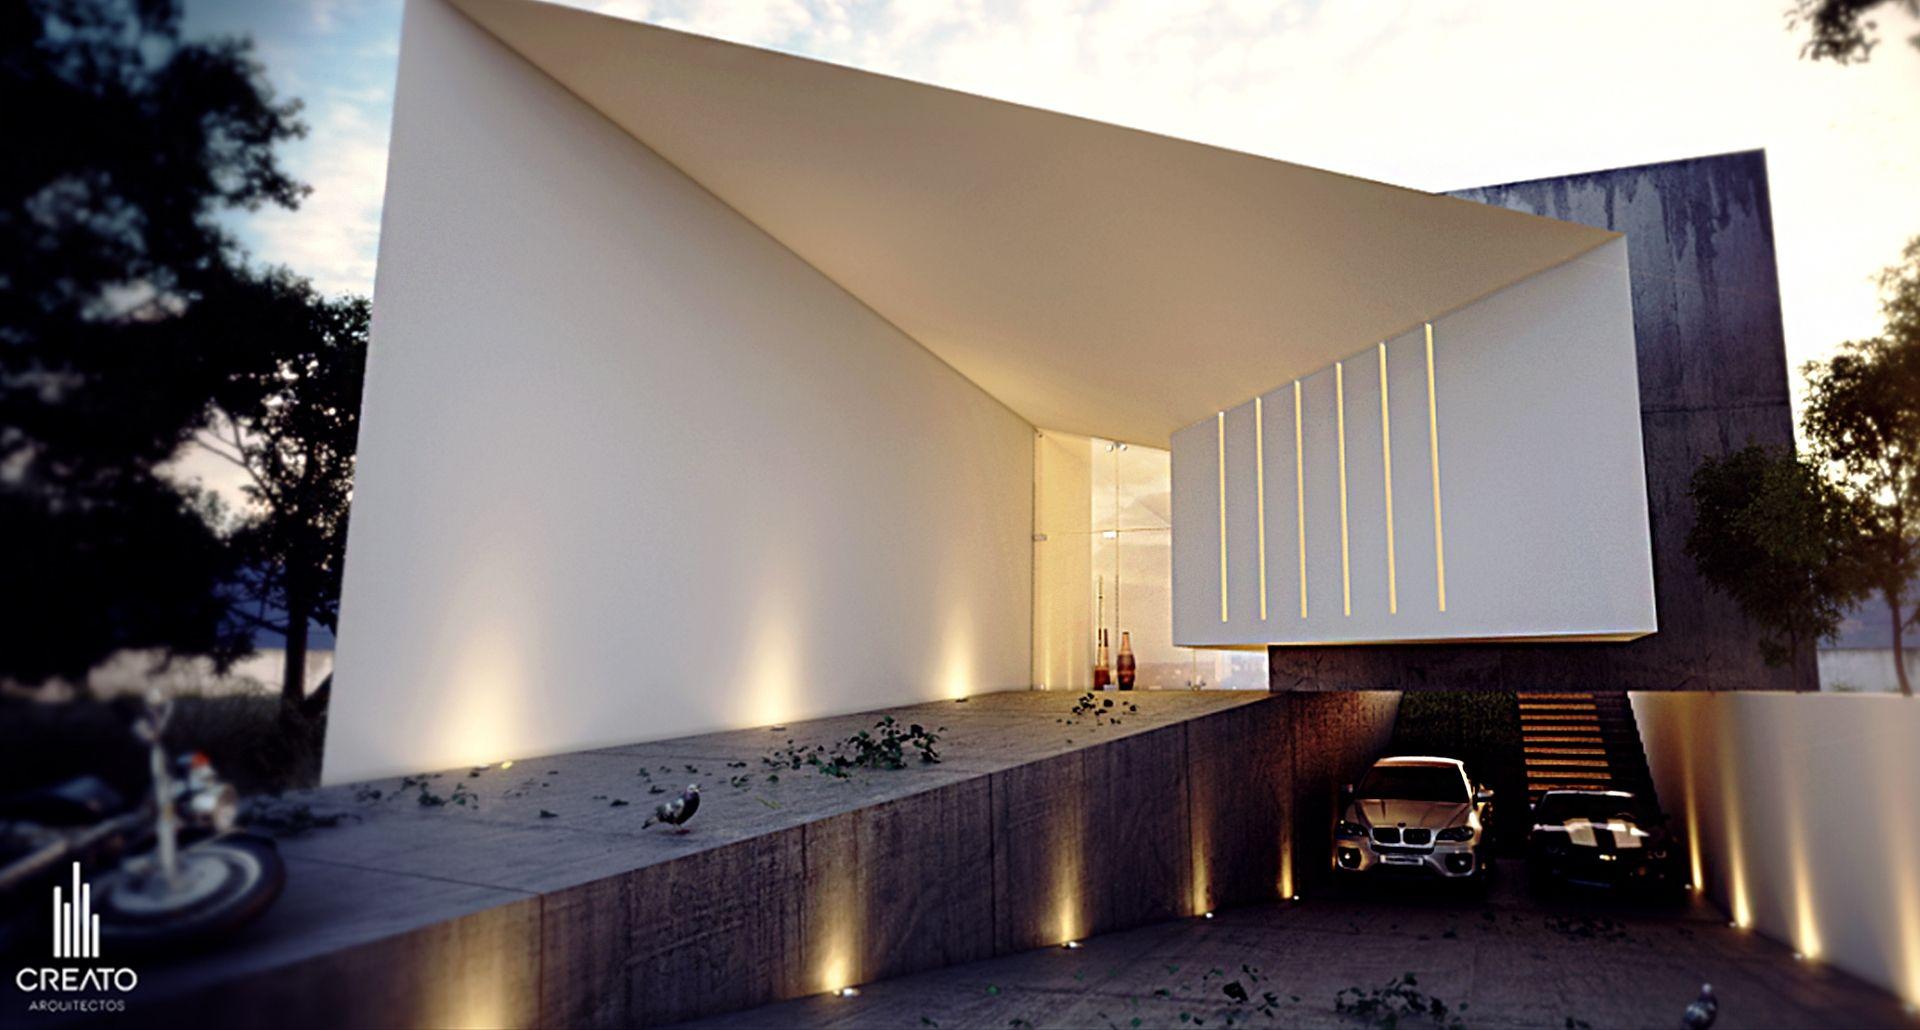 Palomar 141 | Creato Arquitectos